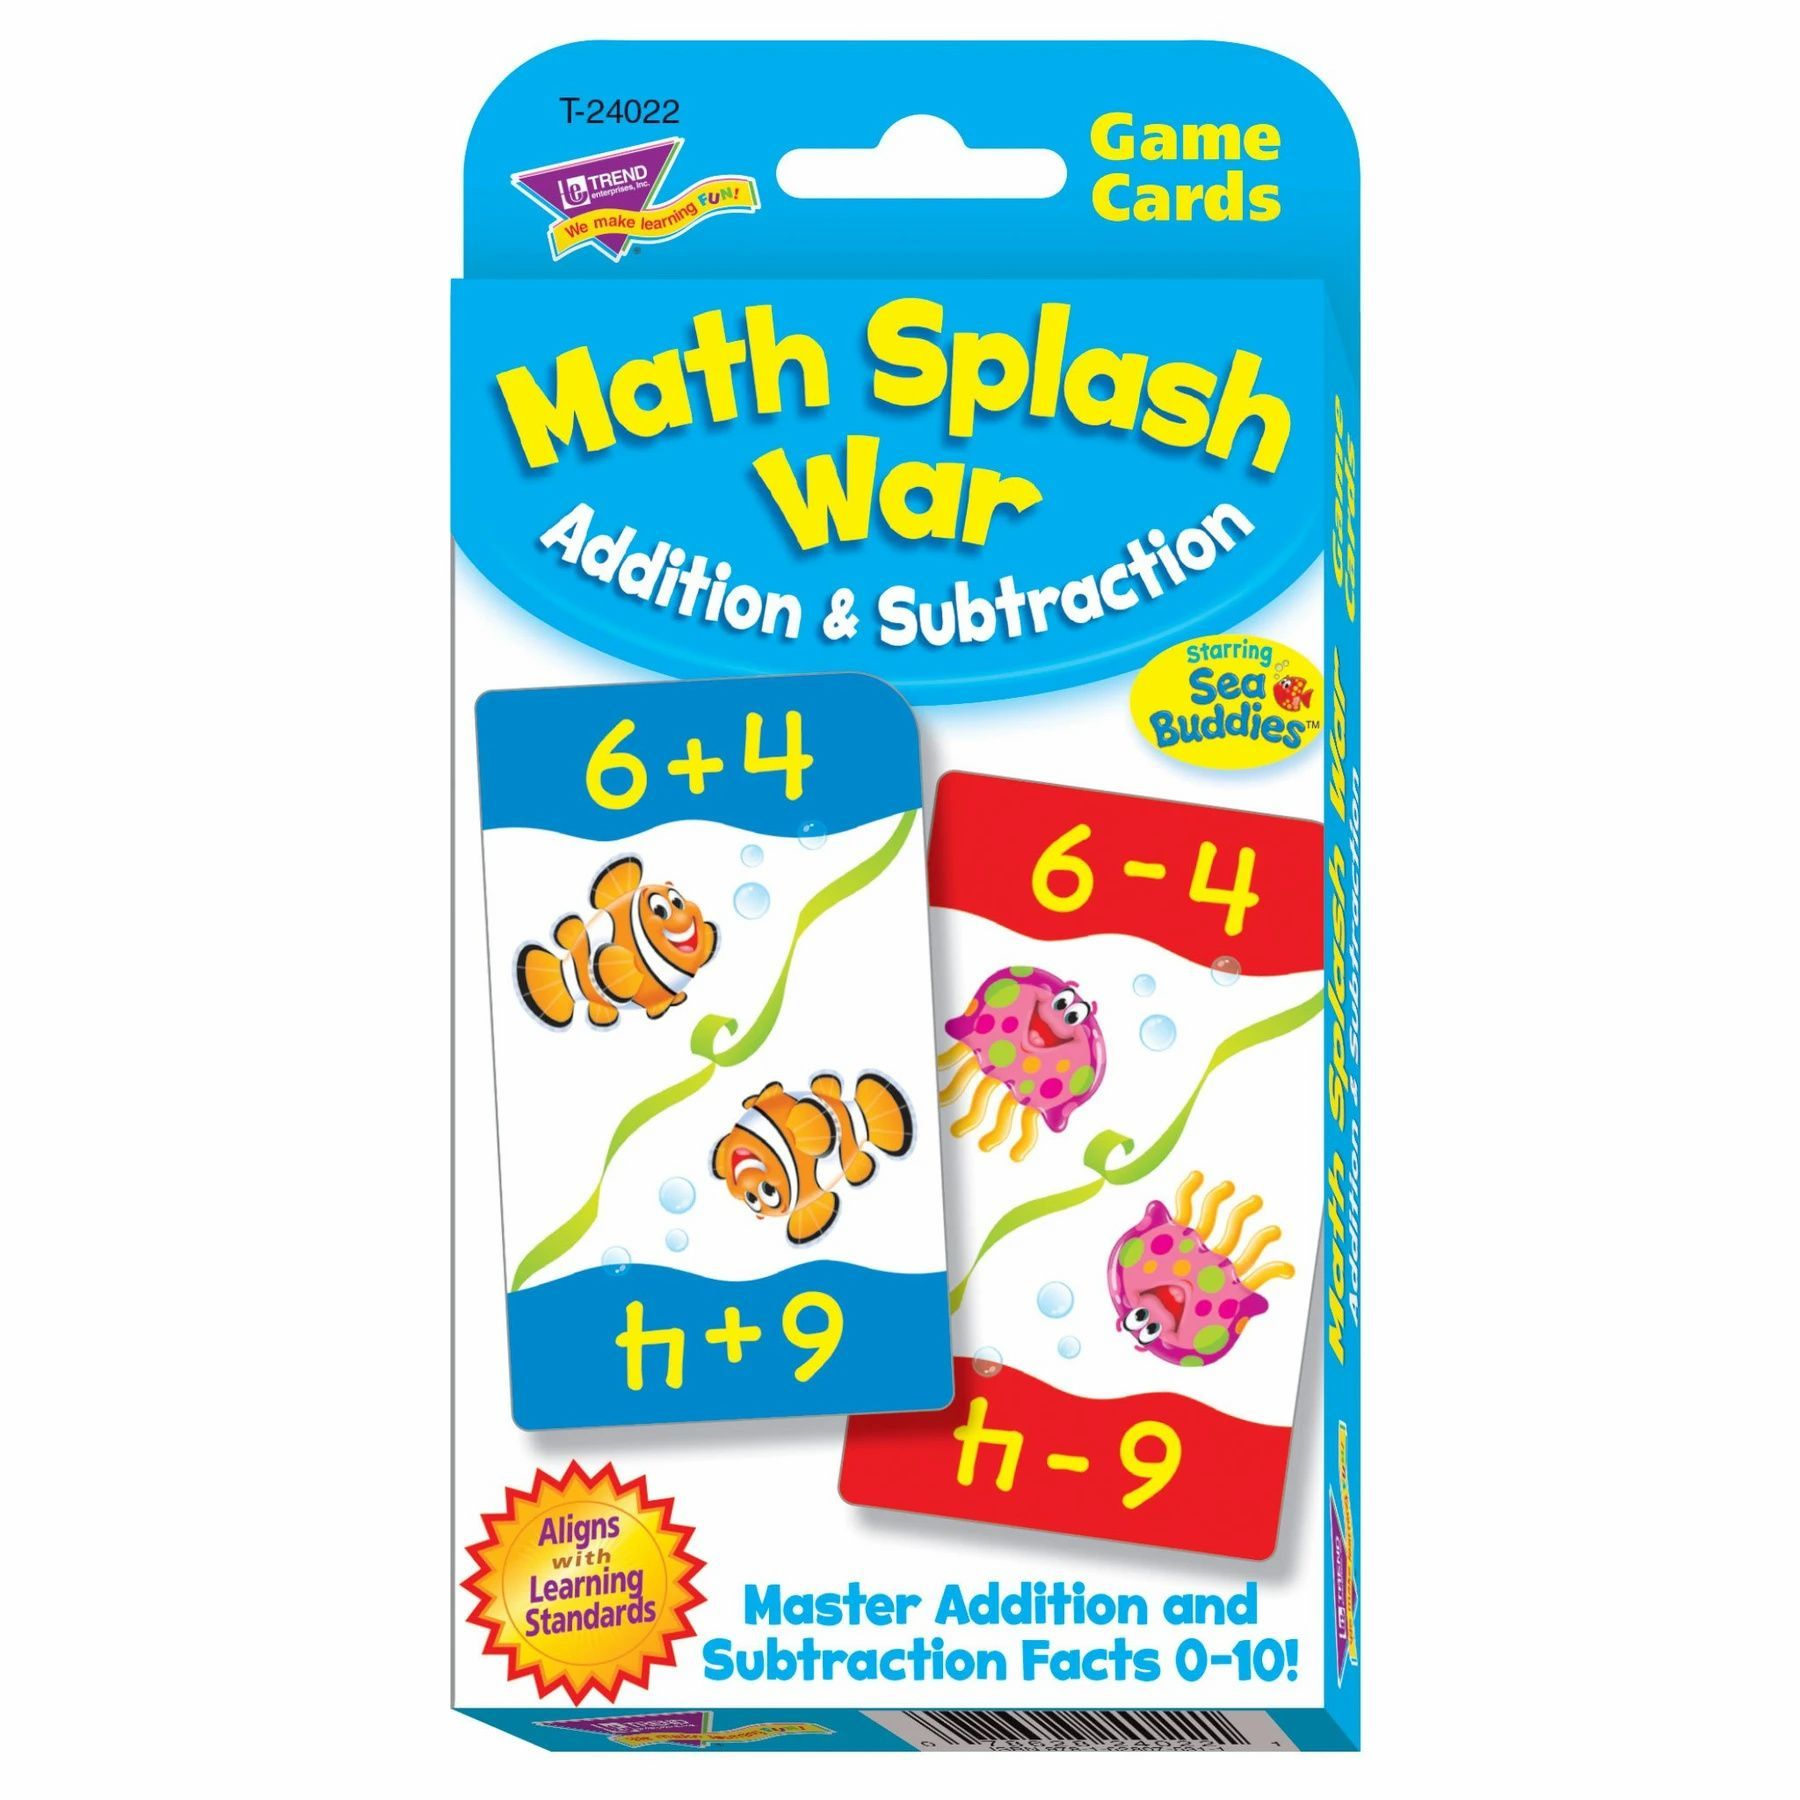 Math Card Game Addition Subtraction War In 2020 Math Card Games Math Games For Kids Fun Math Games